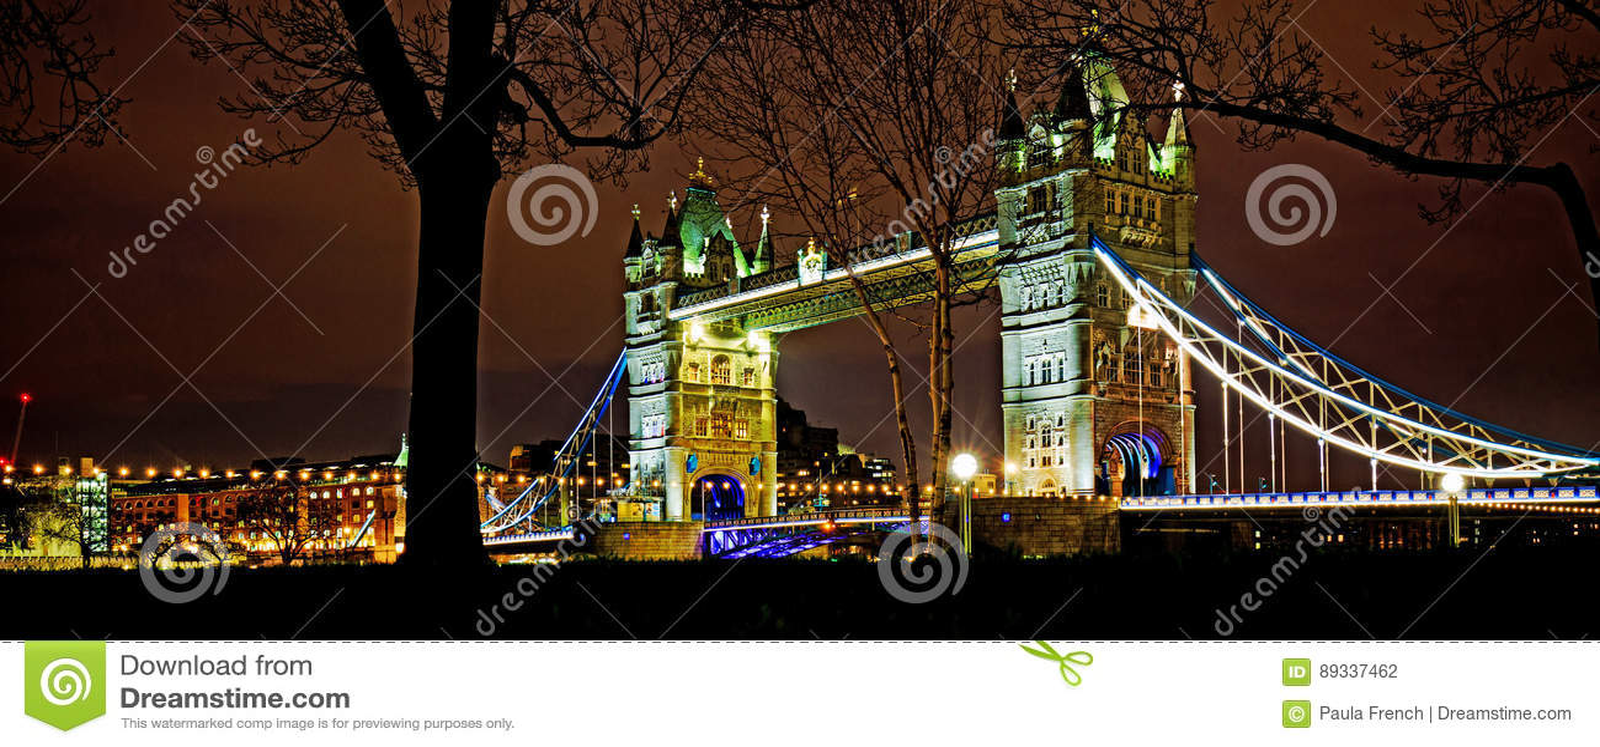 Tower Bridge in London illuminated at night